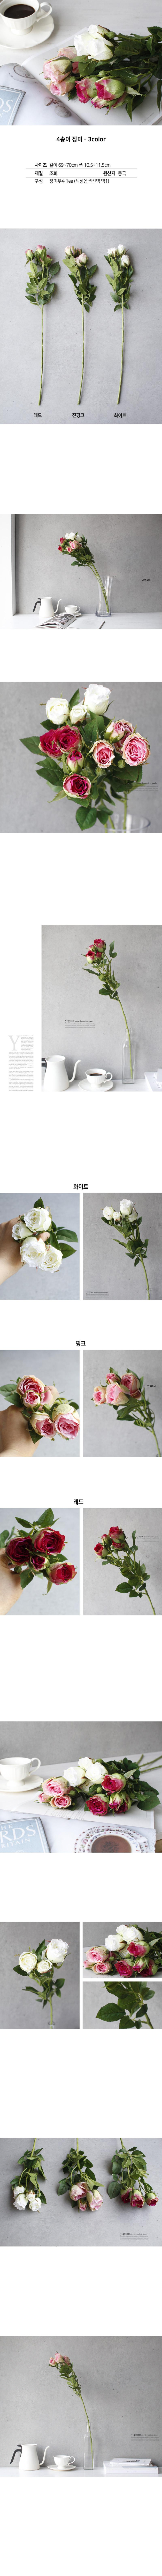 DS-4송이 장미 꽃 다발 3color 조화 장식 - 리빙톡톡, 9,000원, 조화, 부쉬